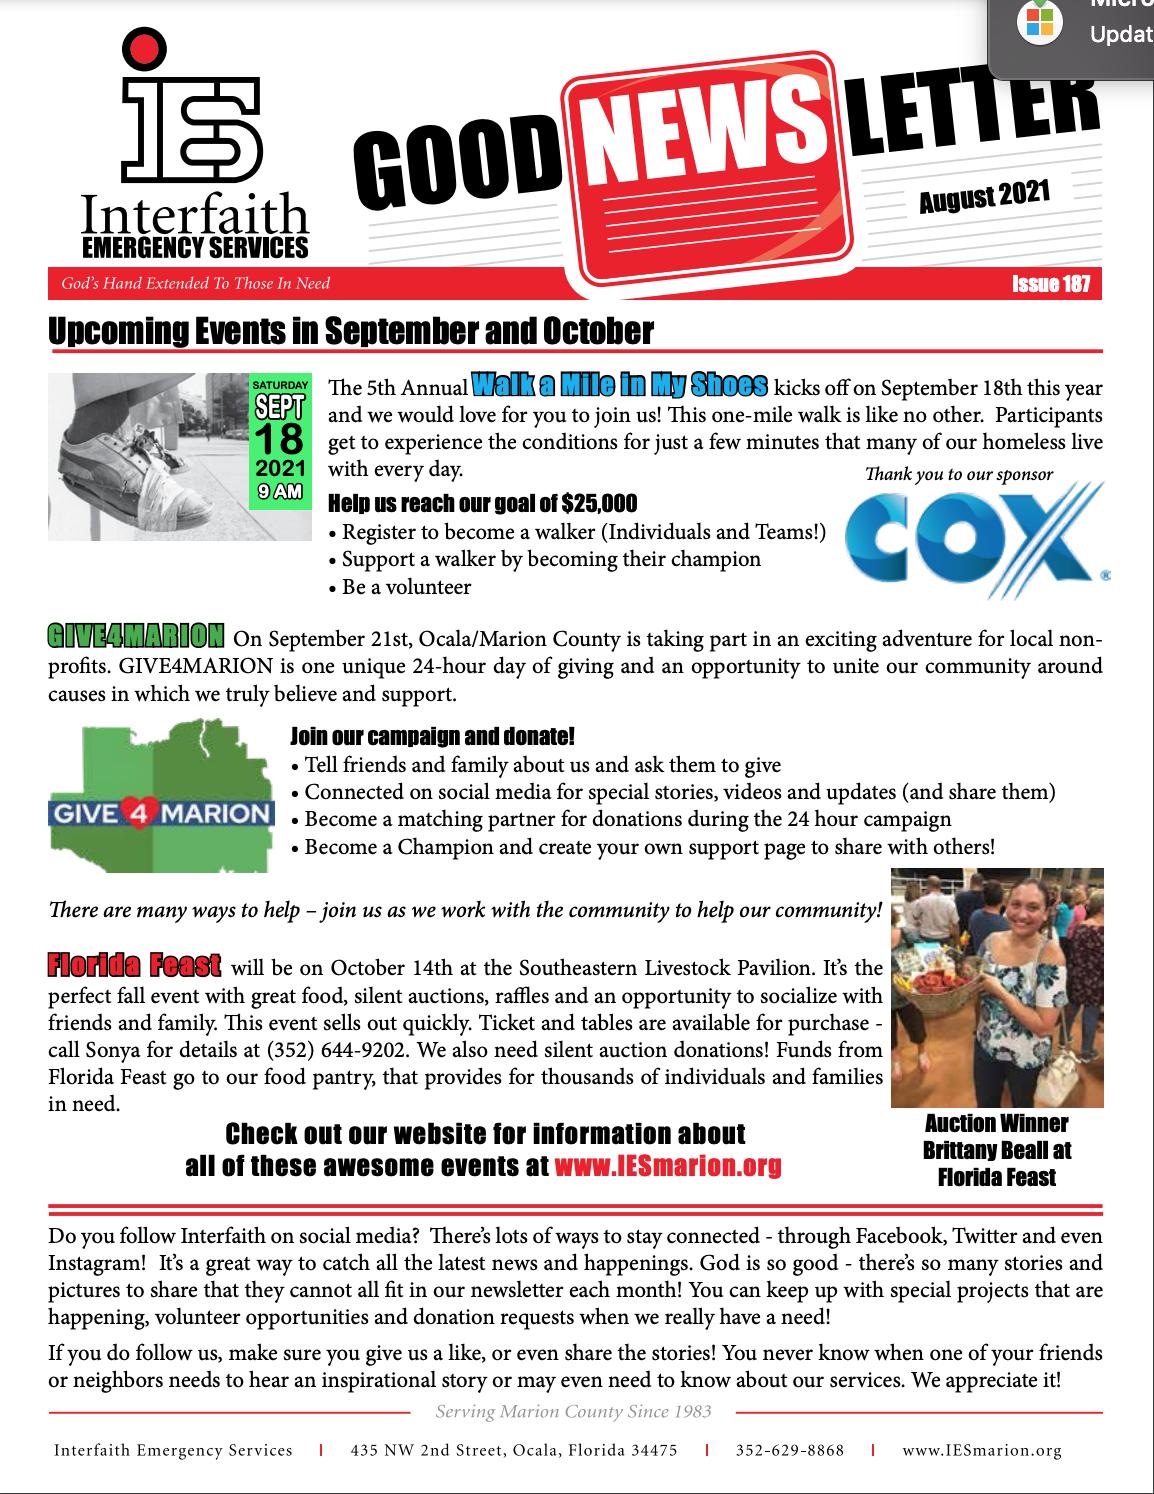 August 2021 IES Newsletter